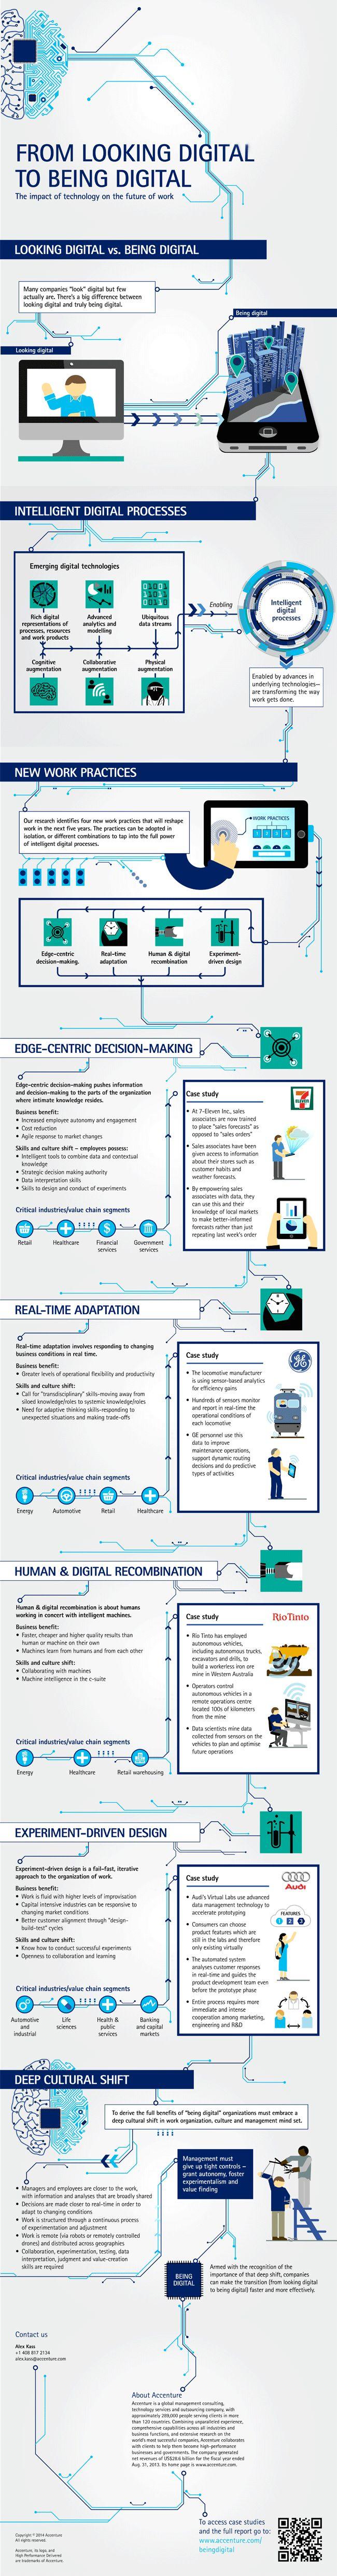 From Looking #Digital to Being Digital - Infographic - @Accenture #digitalmarketing #liveandbreathedigital